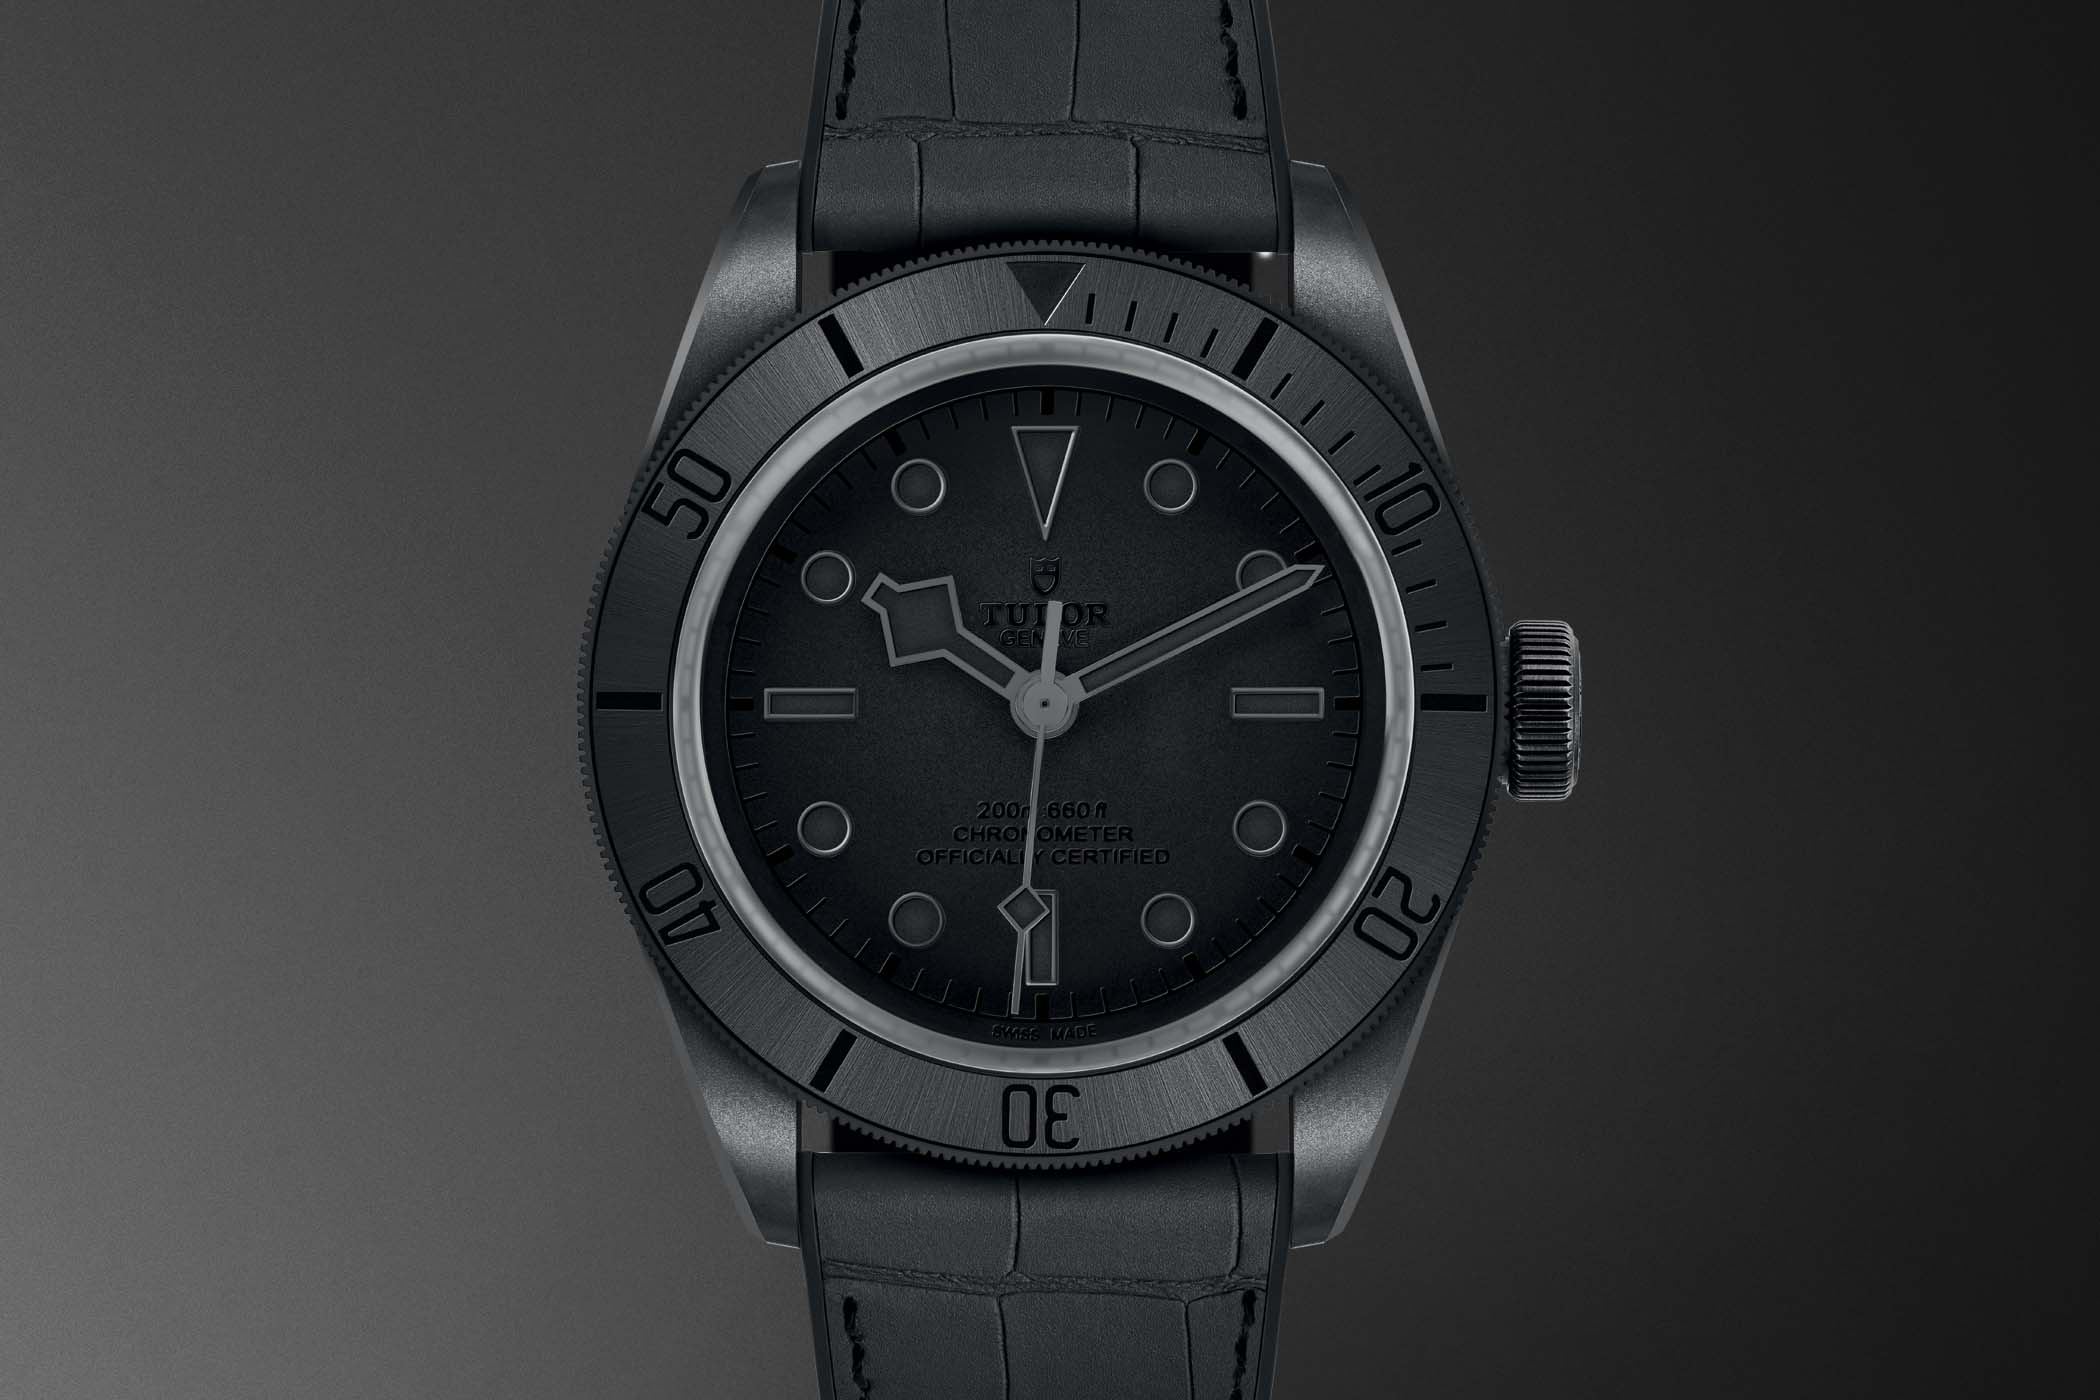 Only Watch 2019 - Tudor Black Bay Ceramic One M7921_001CN